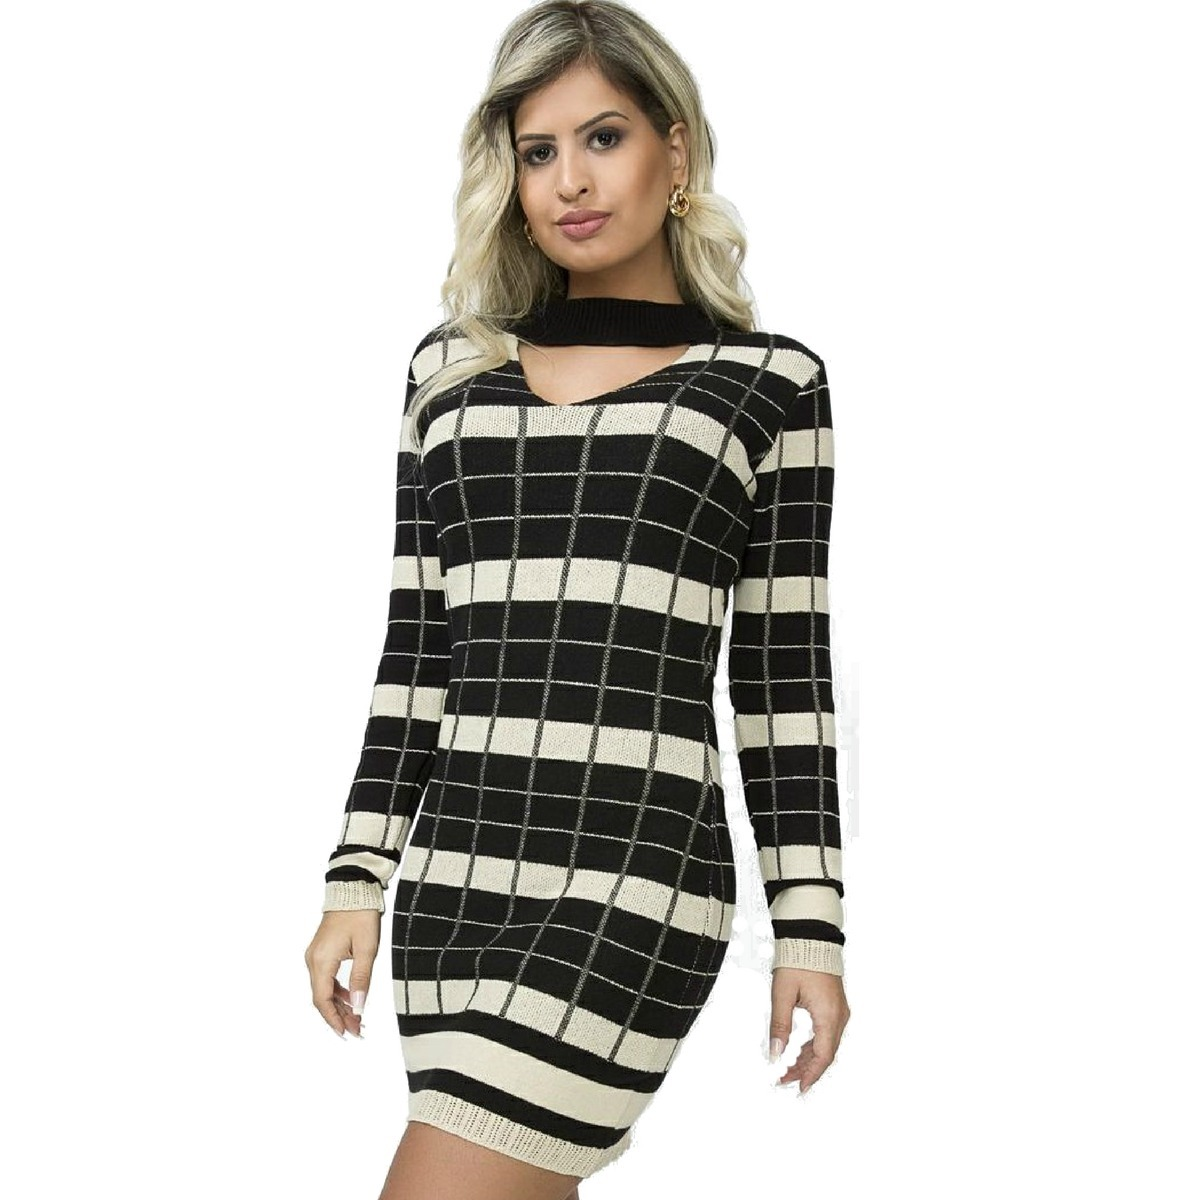 dcc9b8f02 vestido curto preto e branco trico manga longa inverno 2018. Carregando zoom .